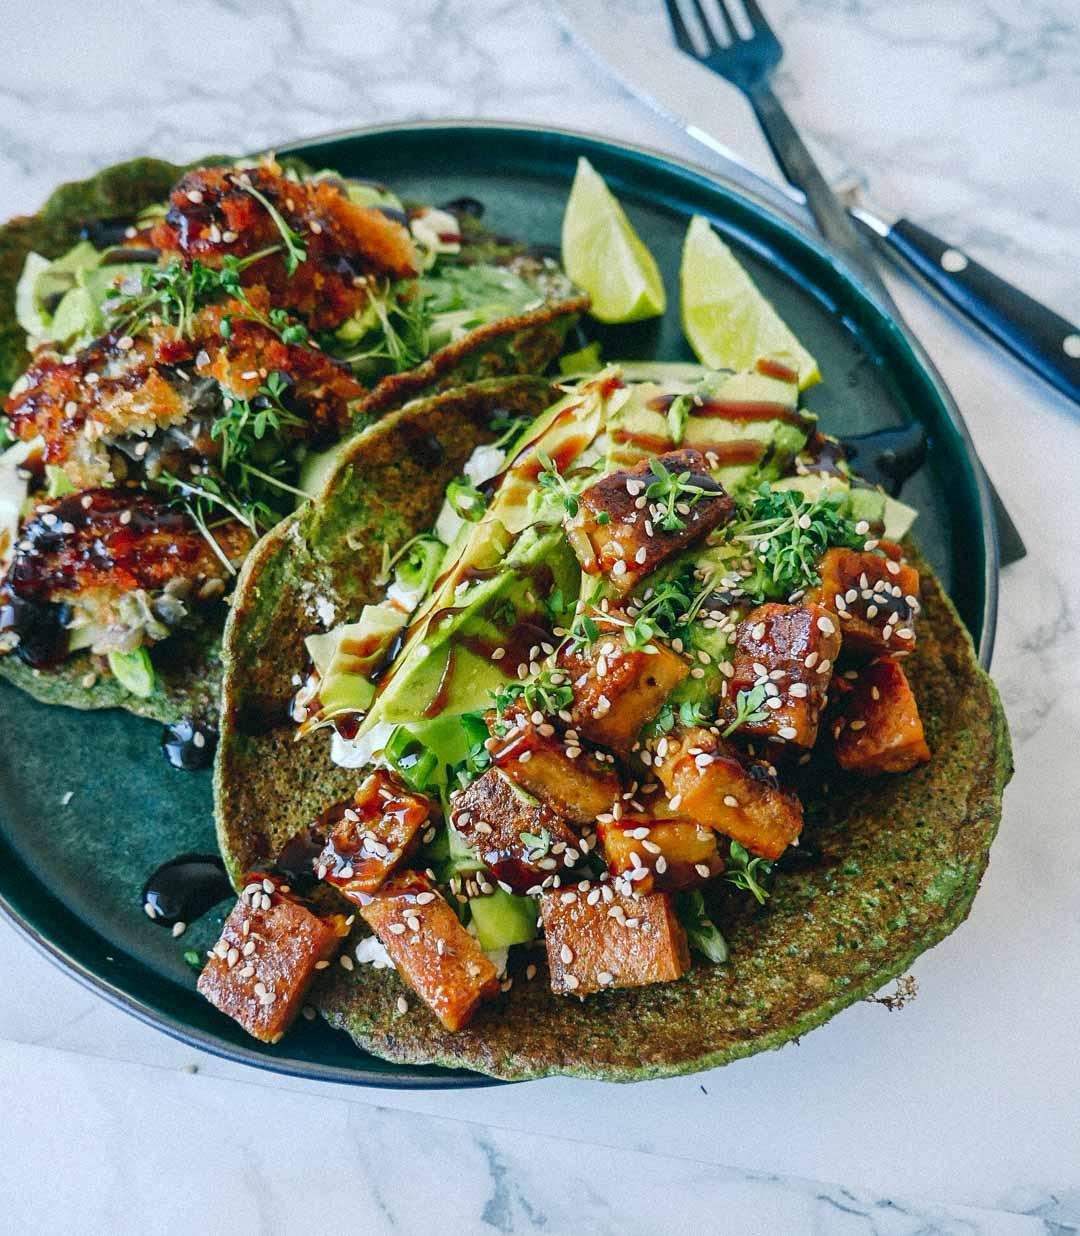 vegansk opskrift på stegt tofu